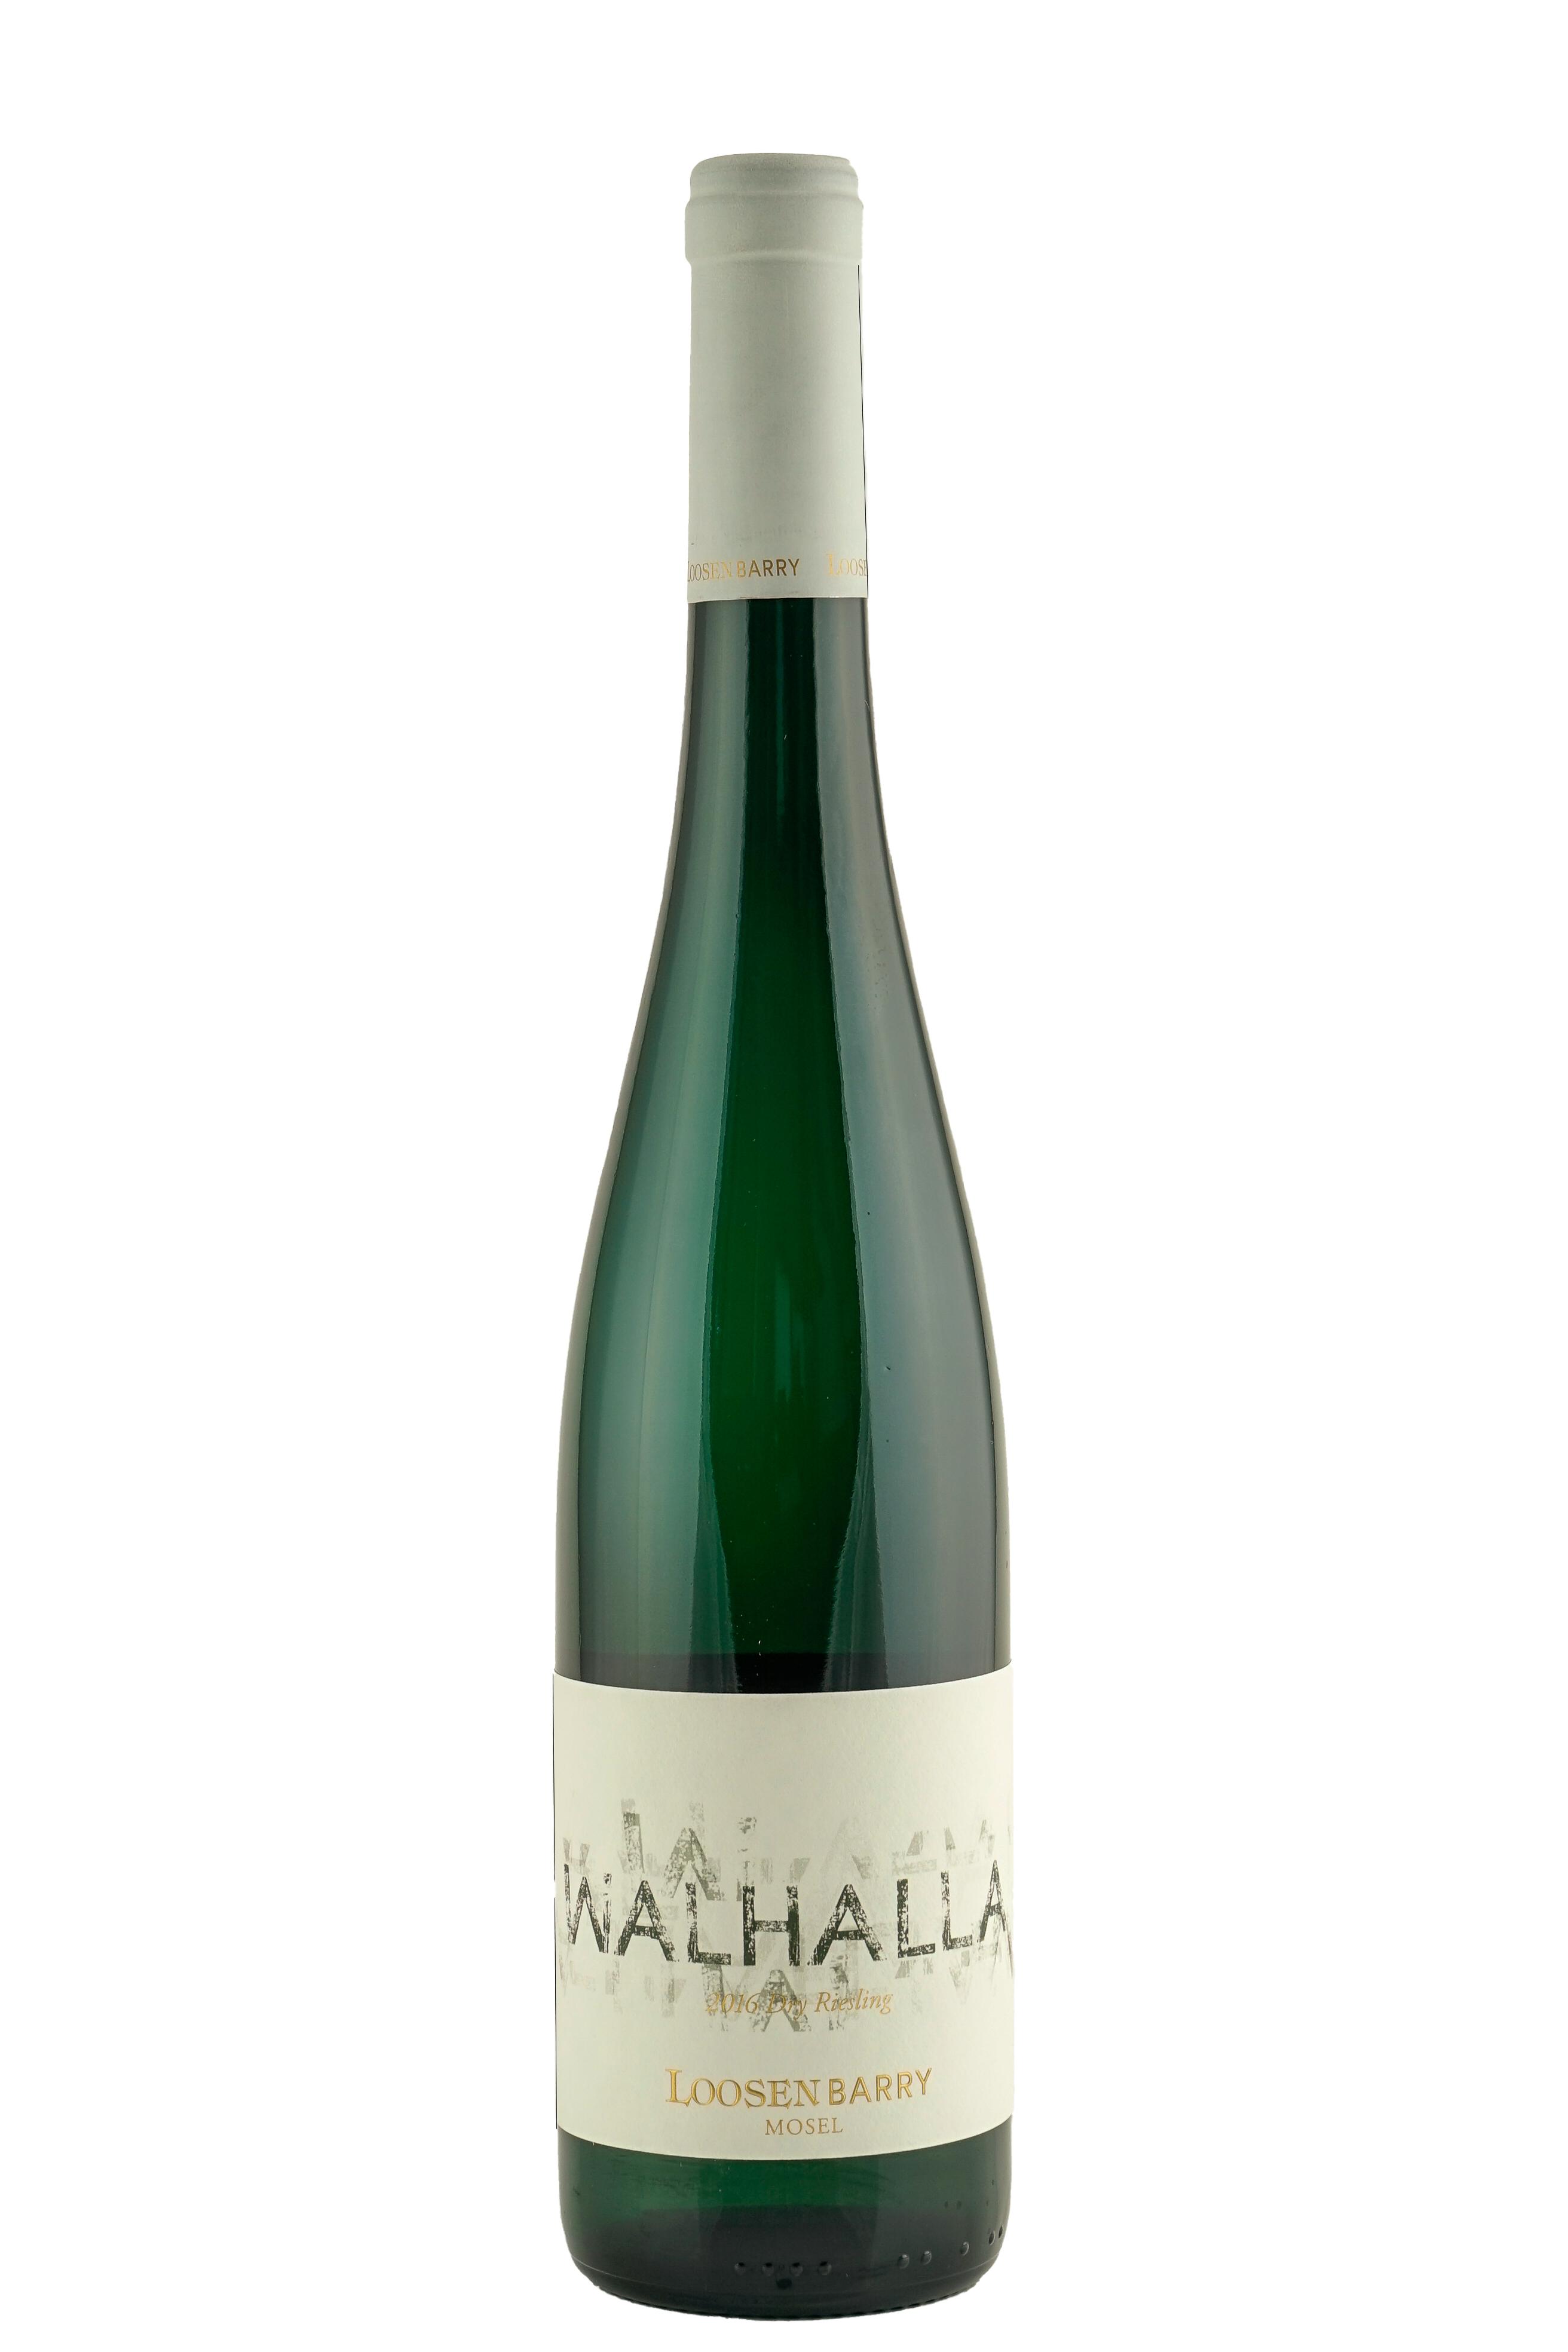 2016 Walhalla Riesling